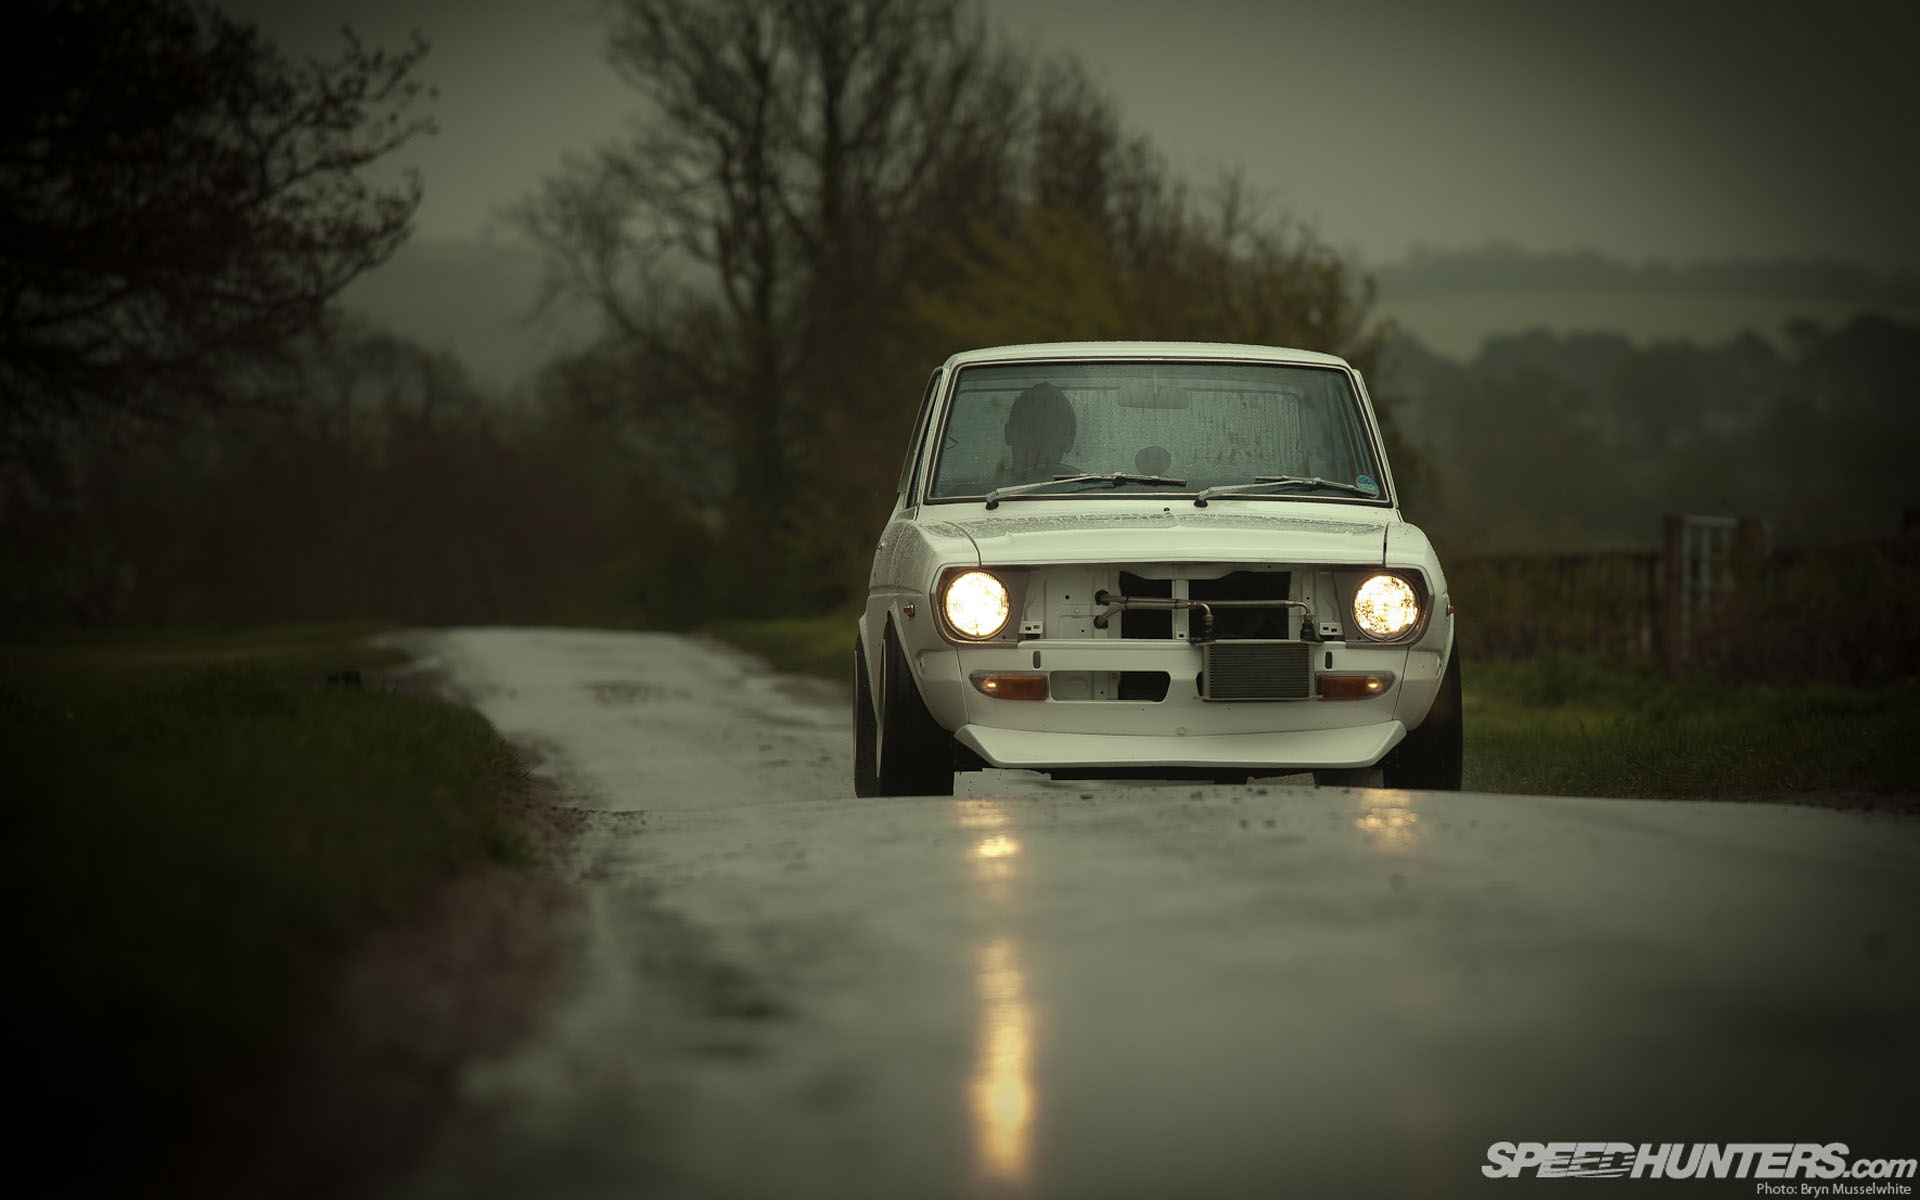 Car Wallpaper 240z Desktops Gt Gt Run Baby Run Speedhunters